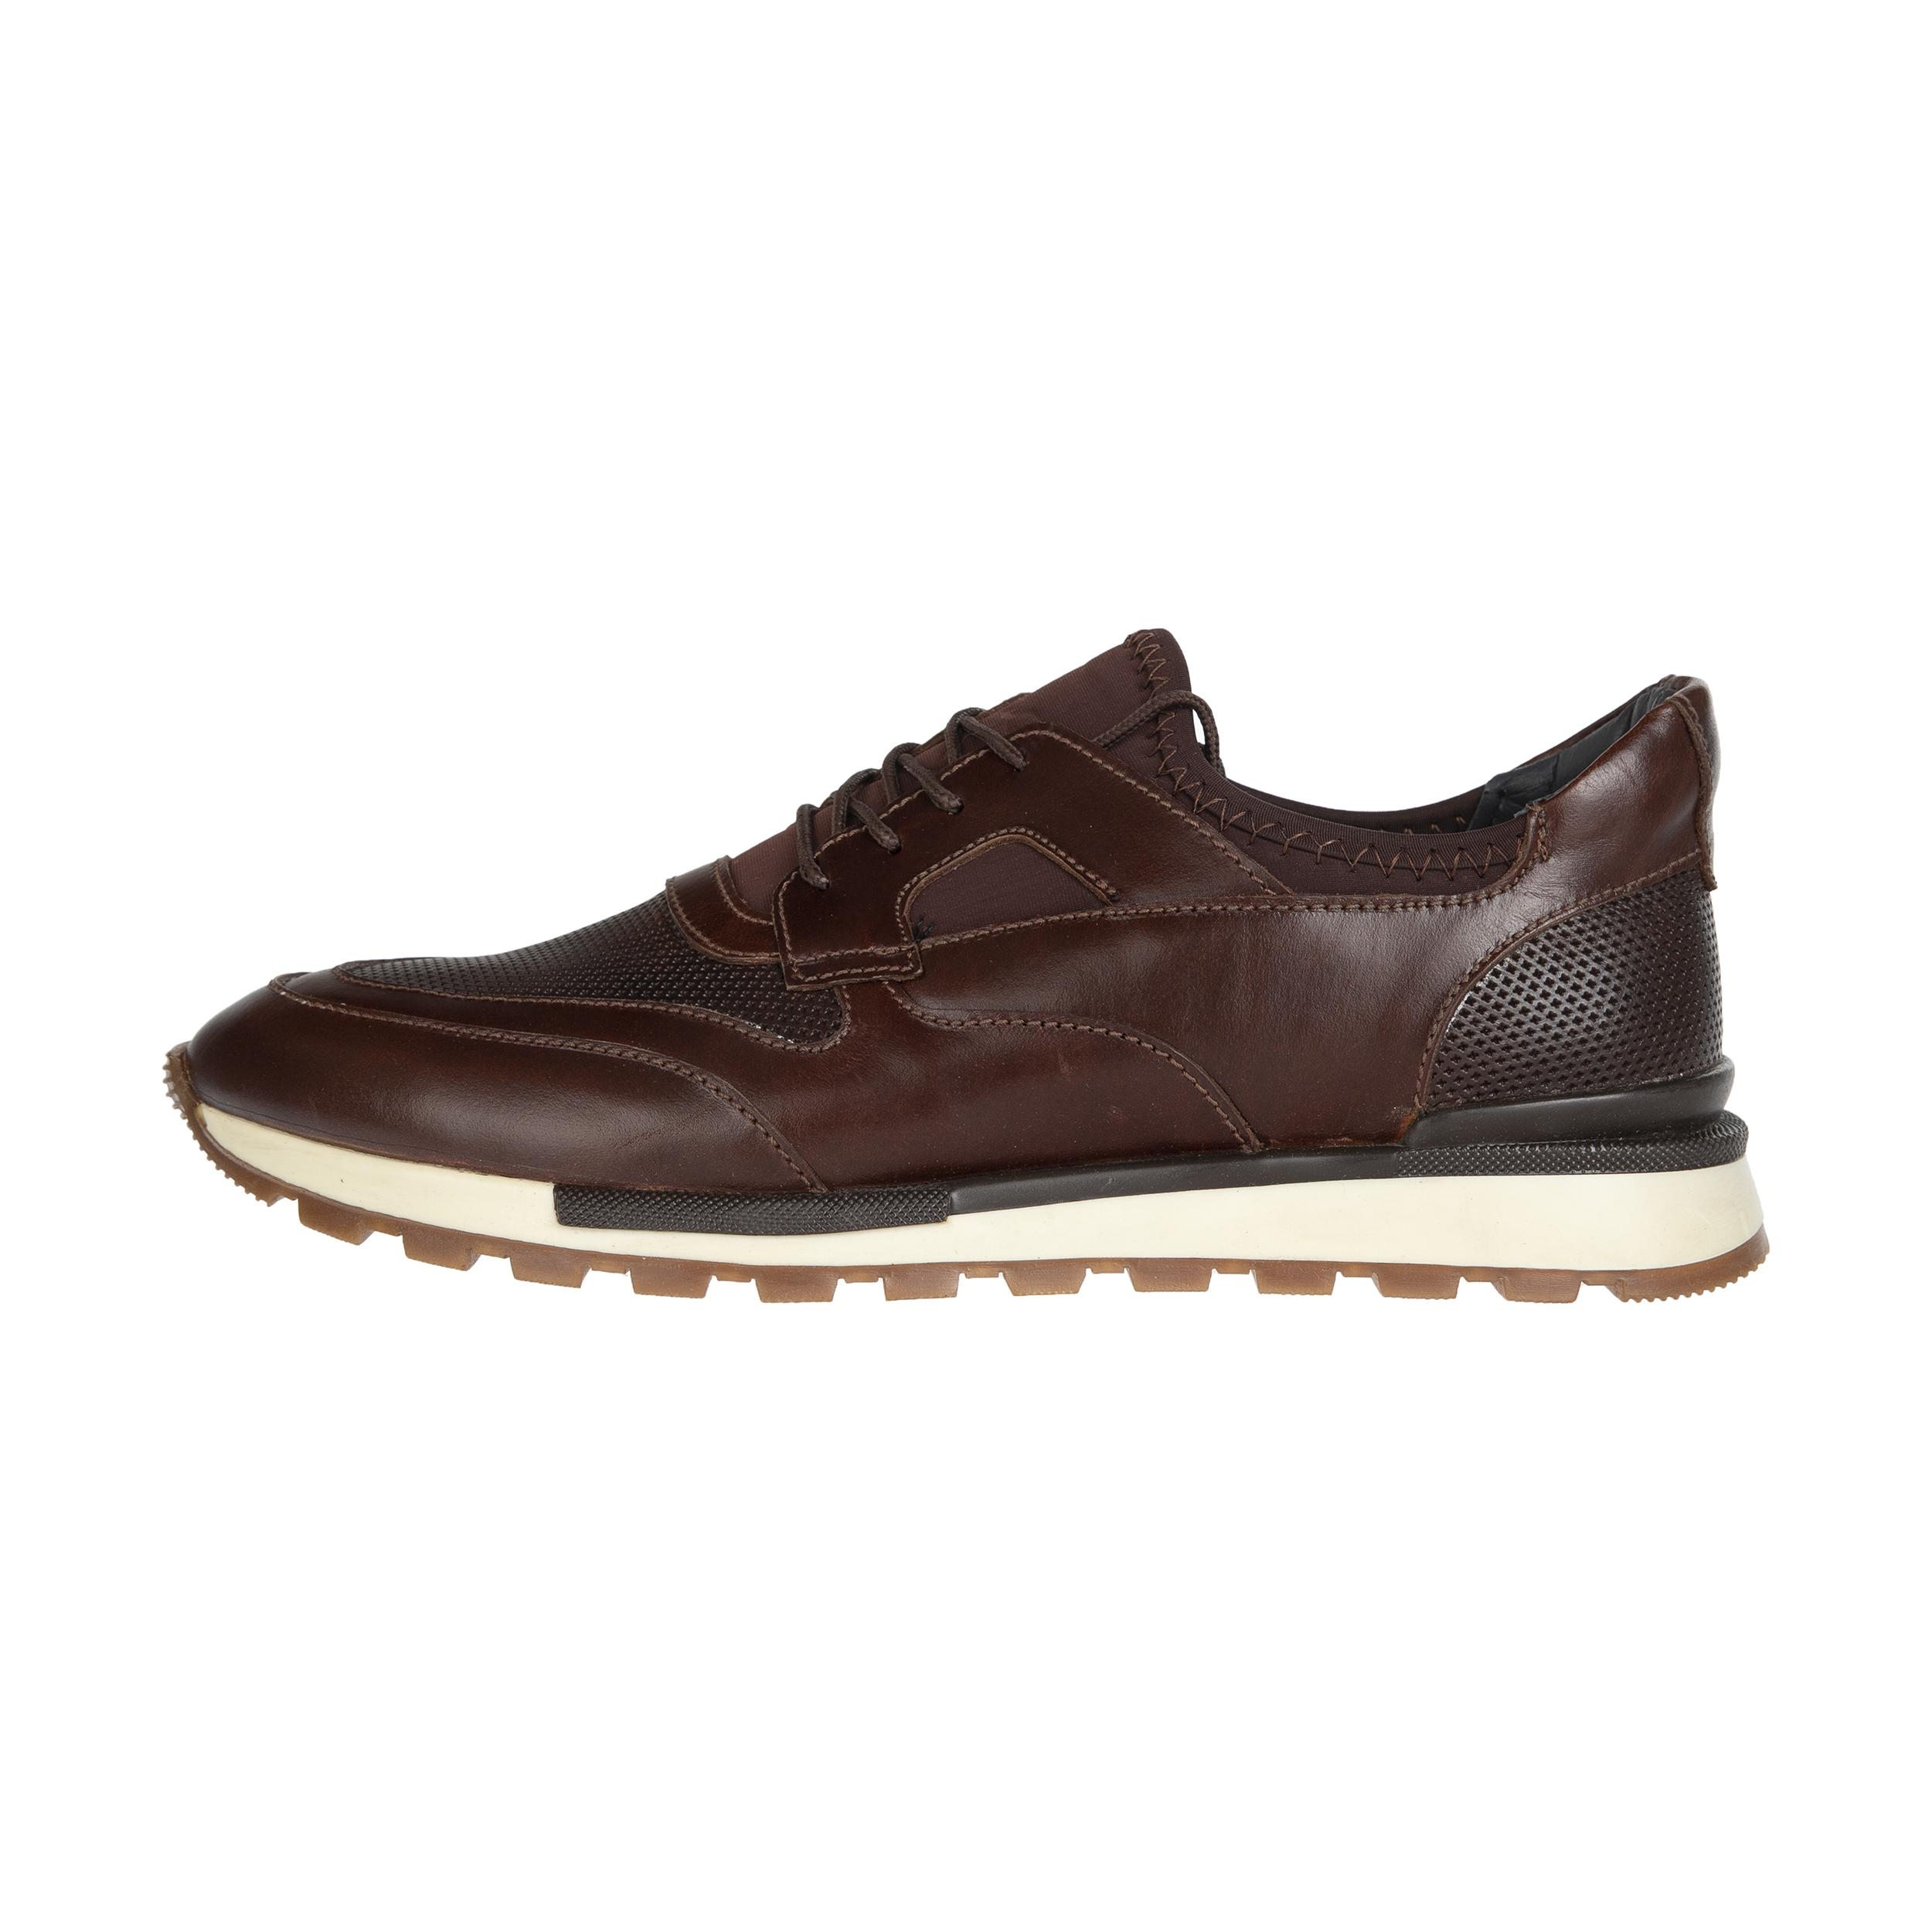 کفش روزمره مردانه دلفارد مدل 8374A503104